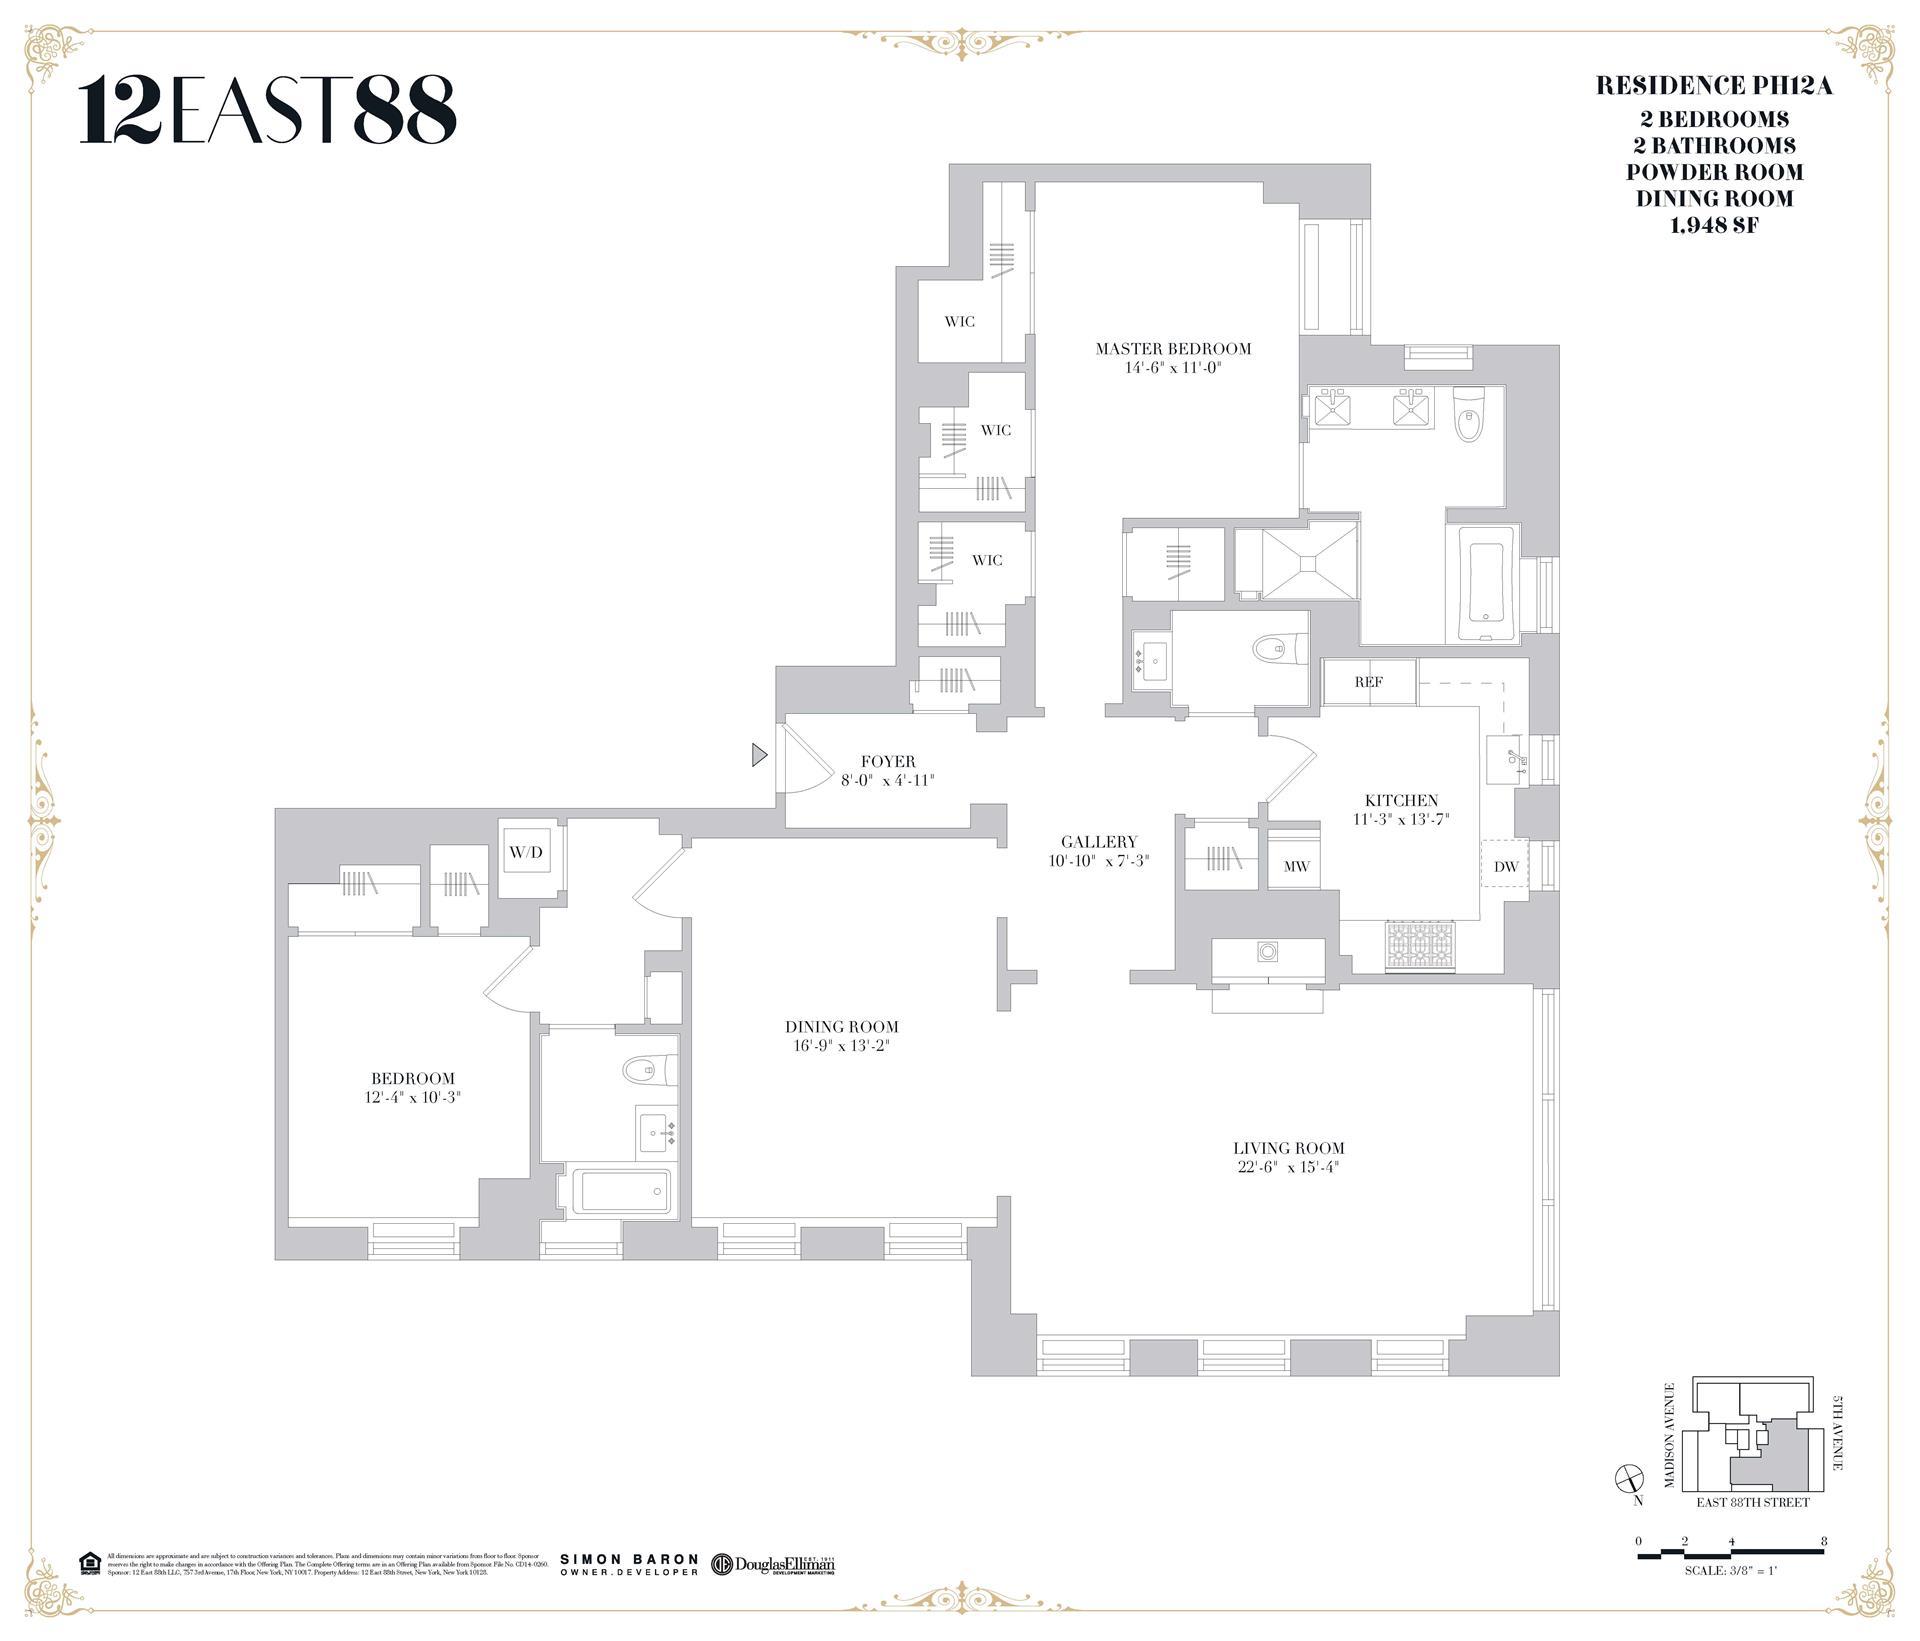 Floor plan of 12 East 88th St, PHA - Carnegie Hill, New York